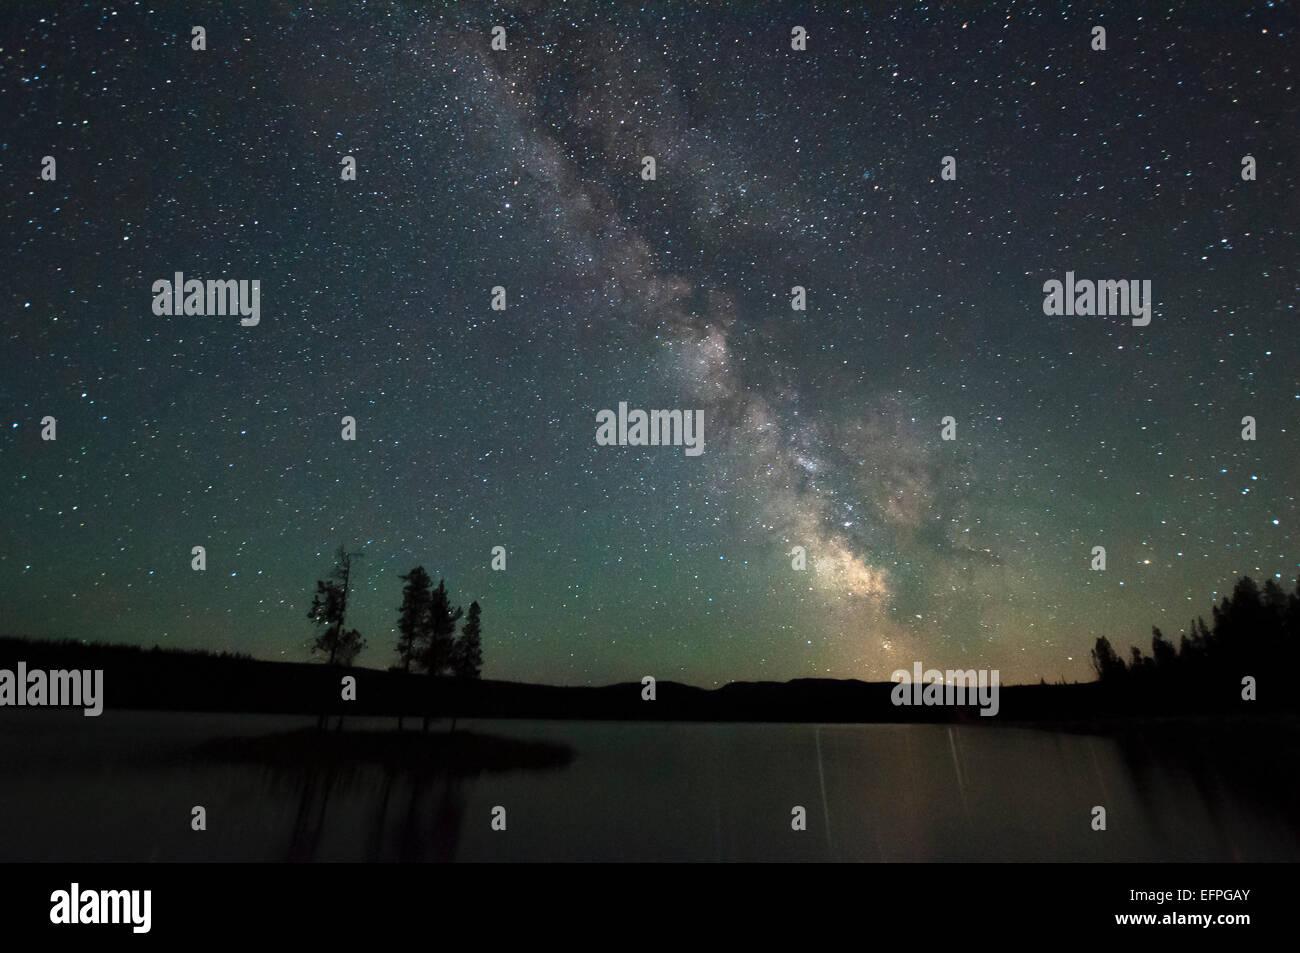 View of lake and stars at night, Thompson Okanagan, Penticton, British Columbia, Canada - Stock Image